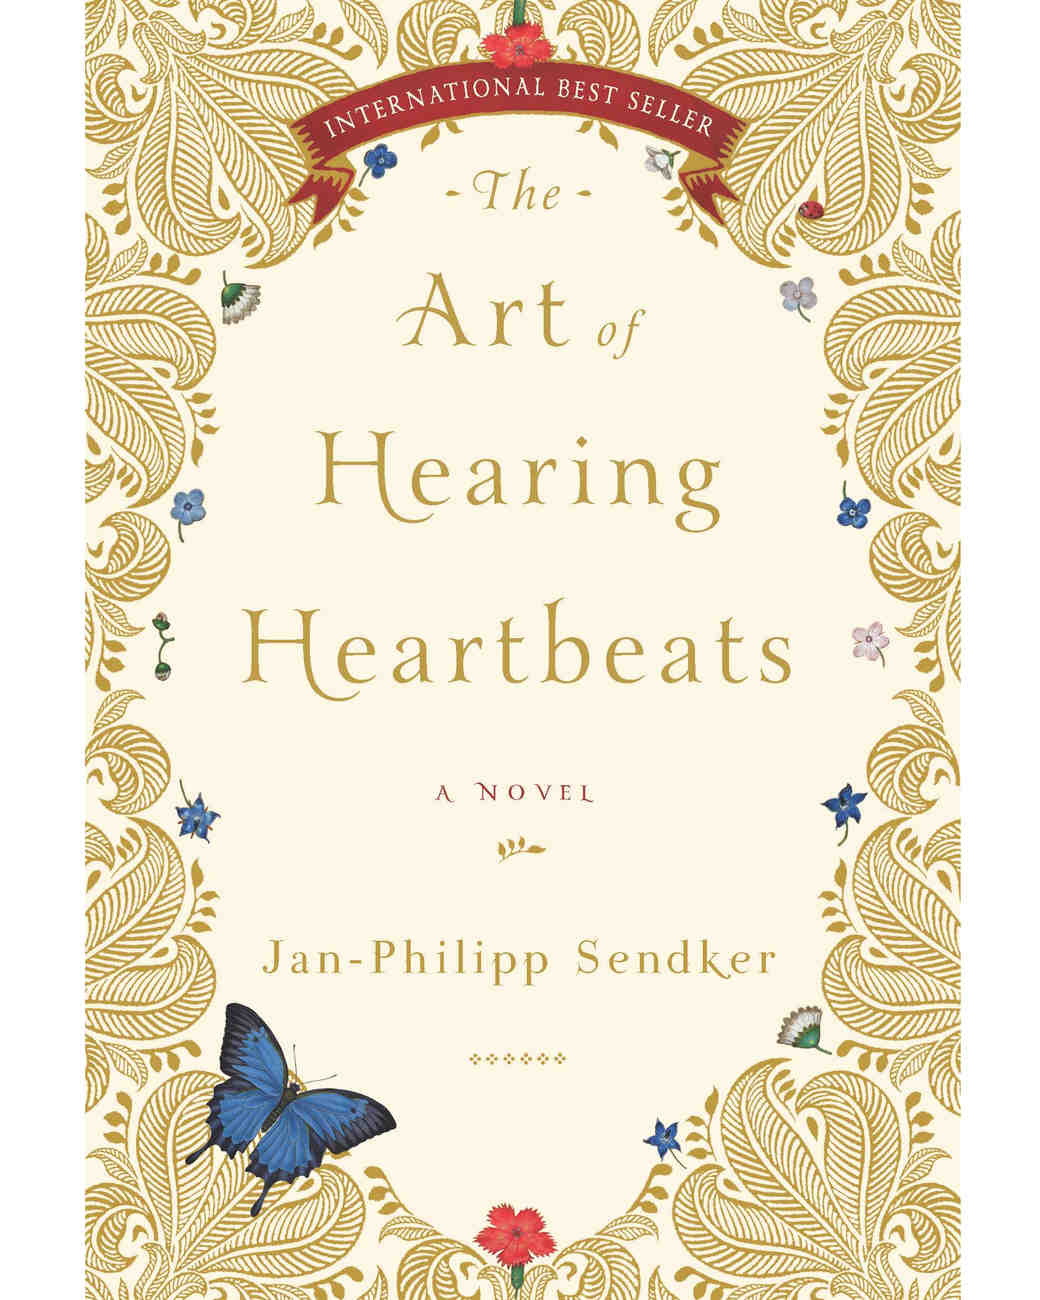 books-read-before-marriage-art-hearing-heartbeats-sendker-0115.jpg